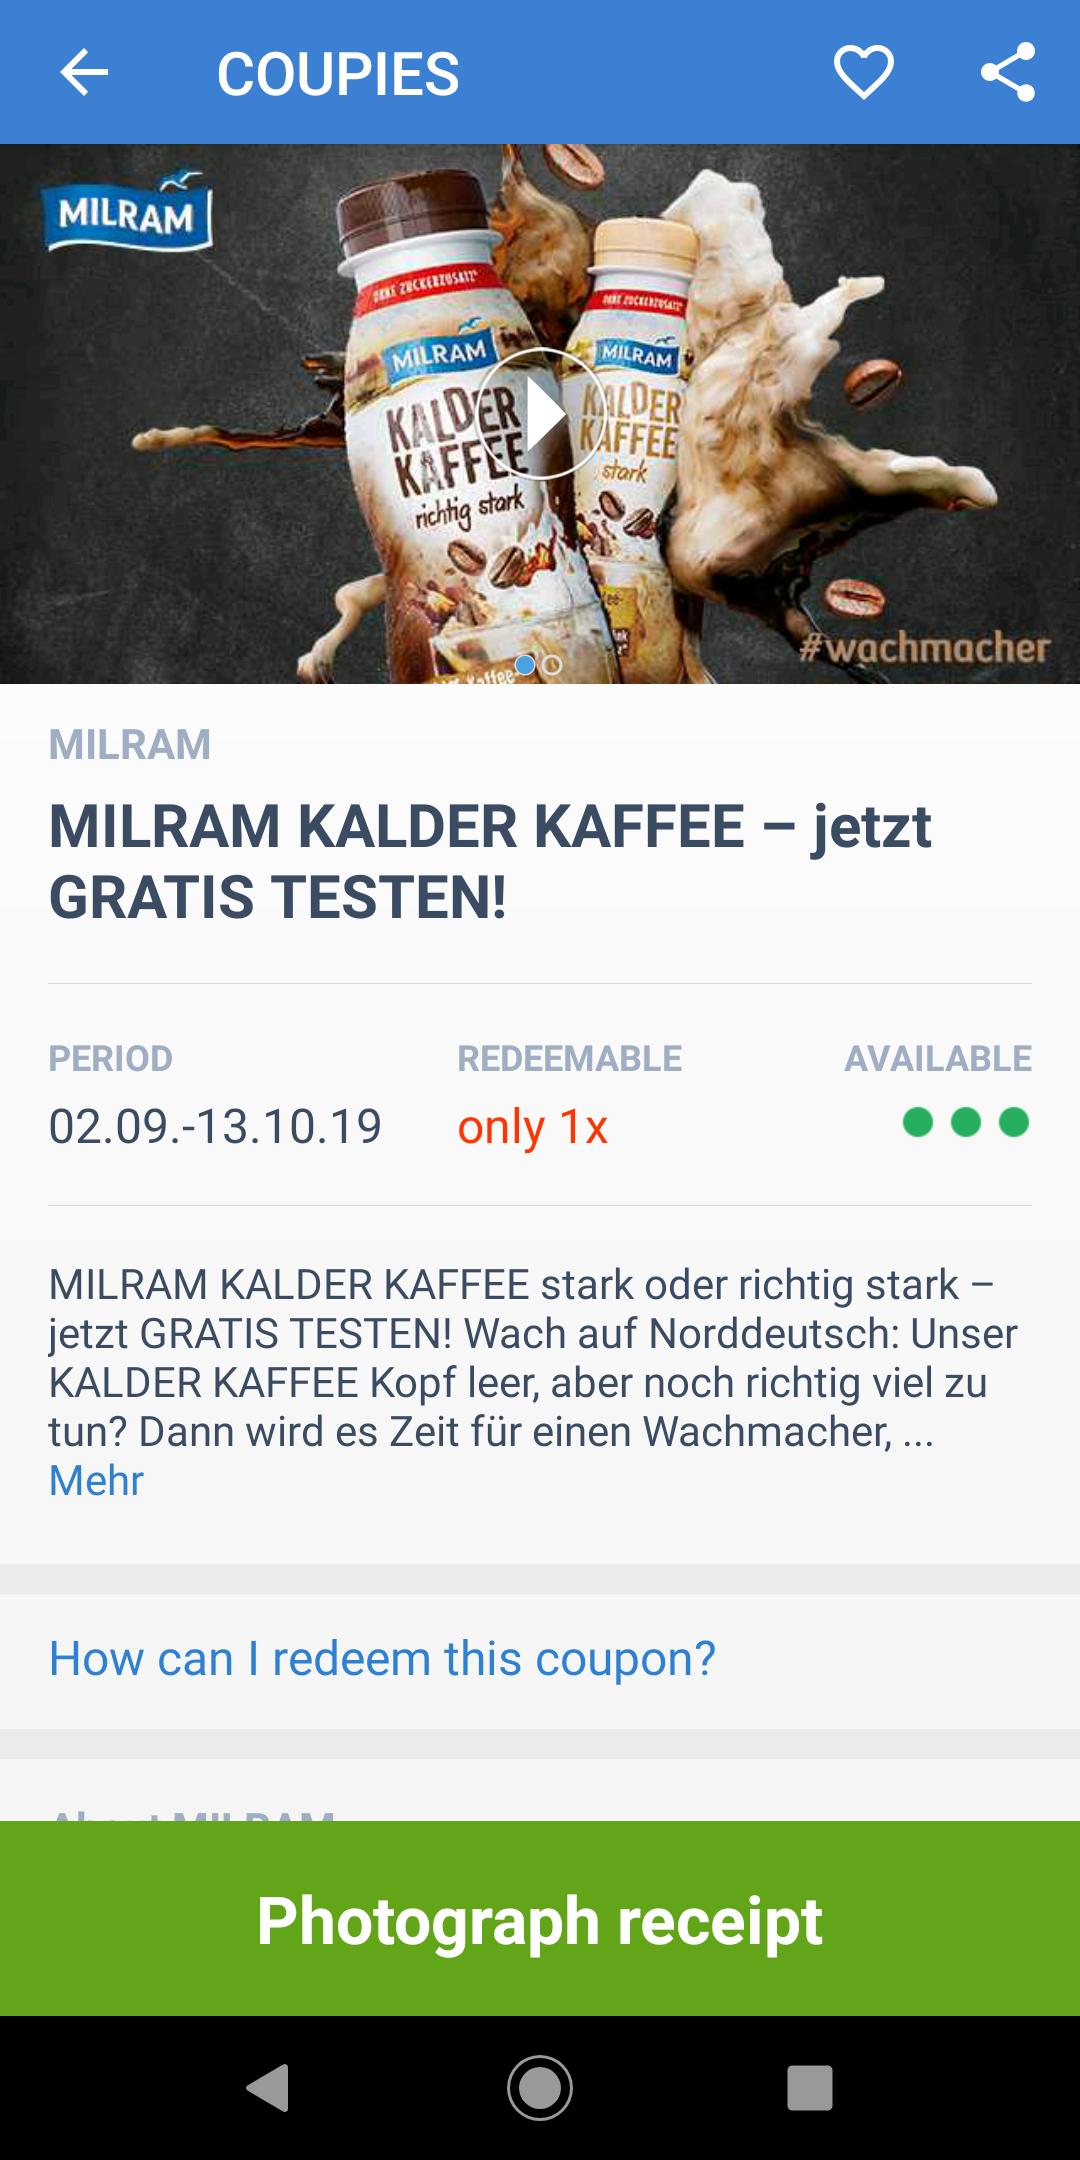 2 x 1 Milram Kalder Kaffee gratis dank Coupies und Edeka-App